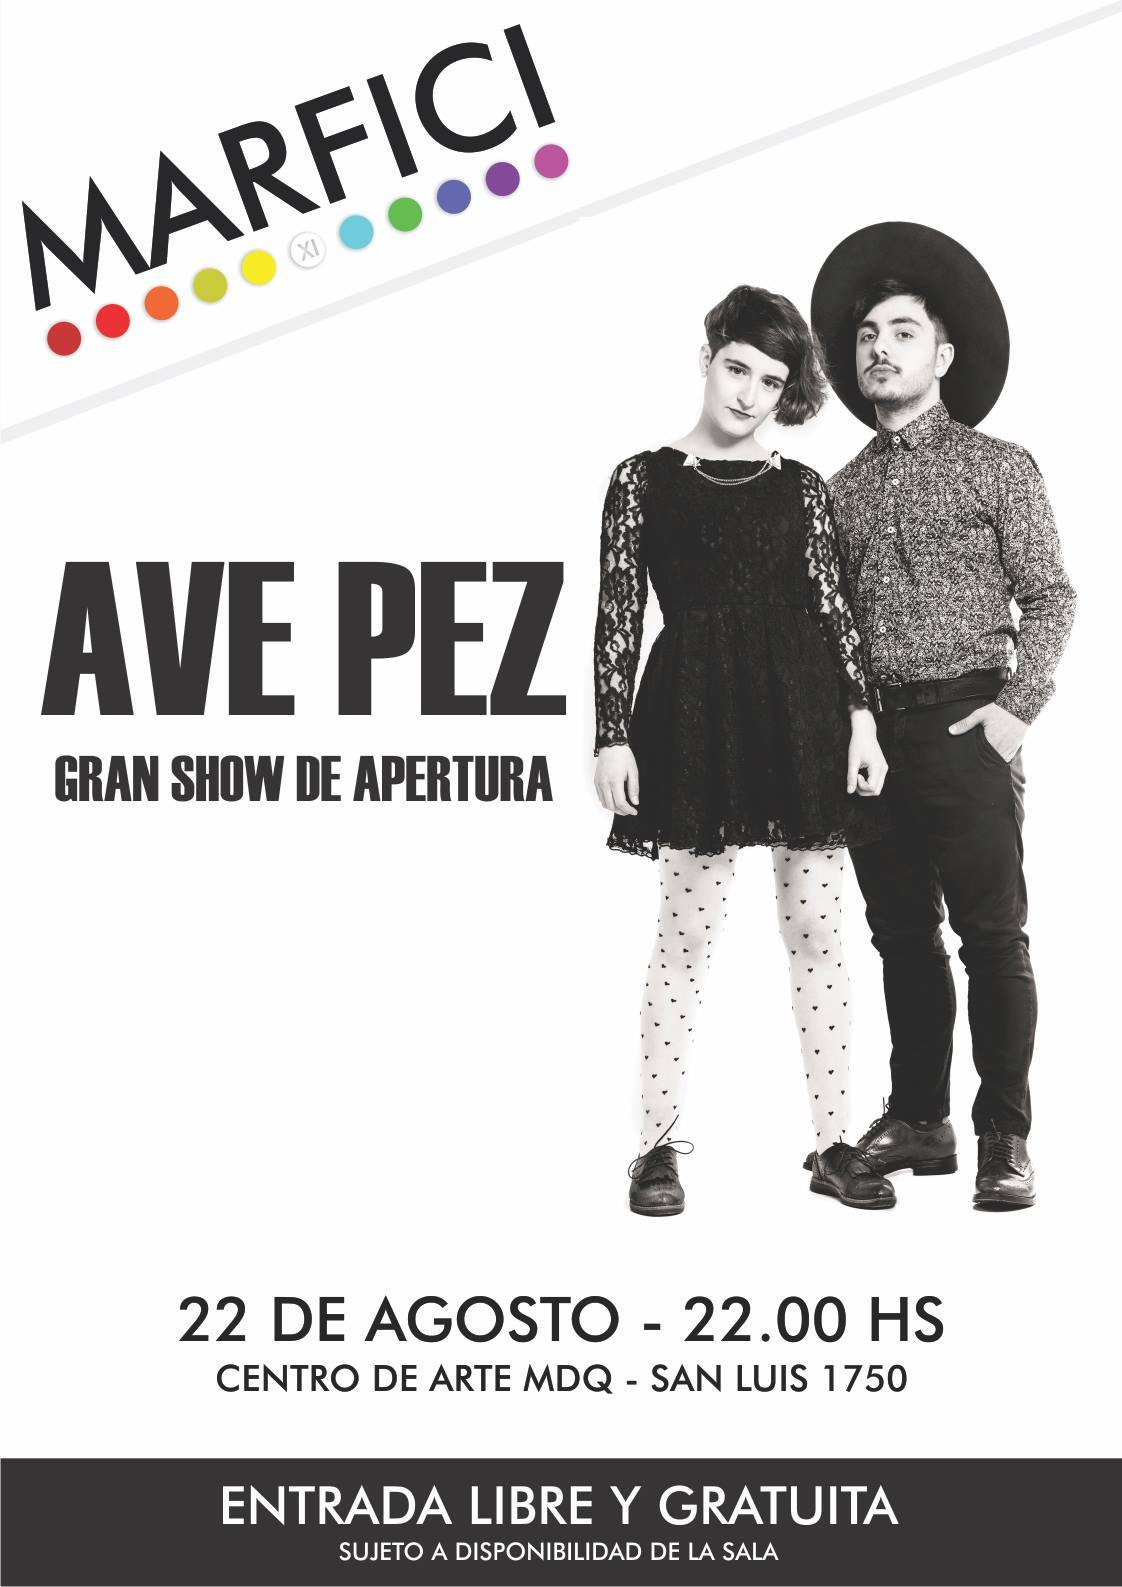 Ave Pez tocará en el show de apertura del MARFICI